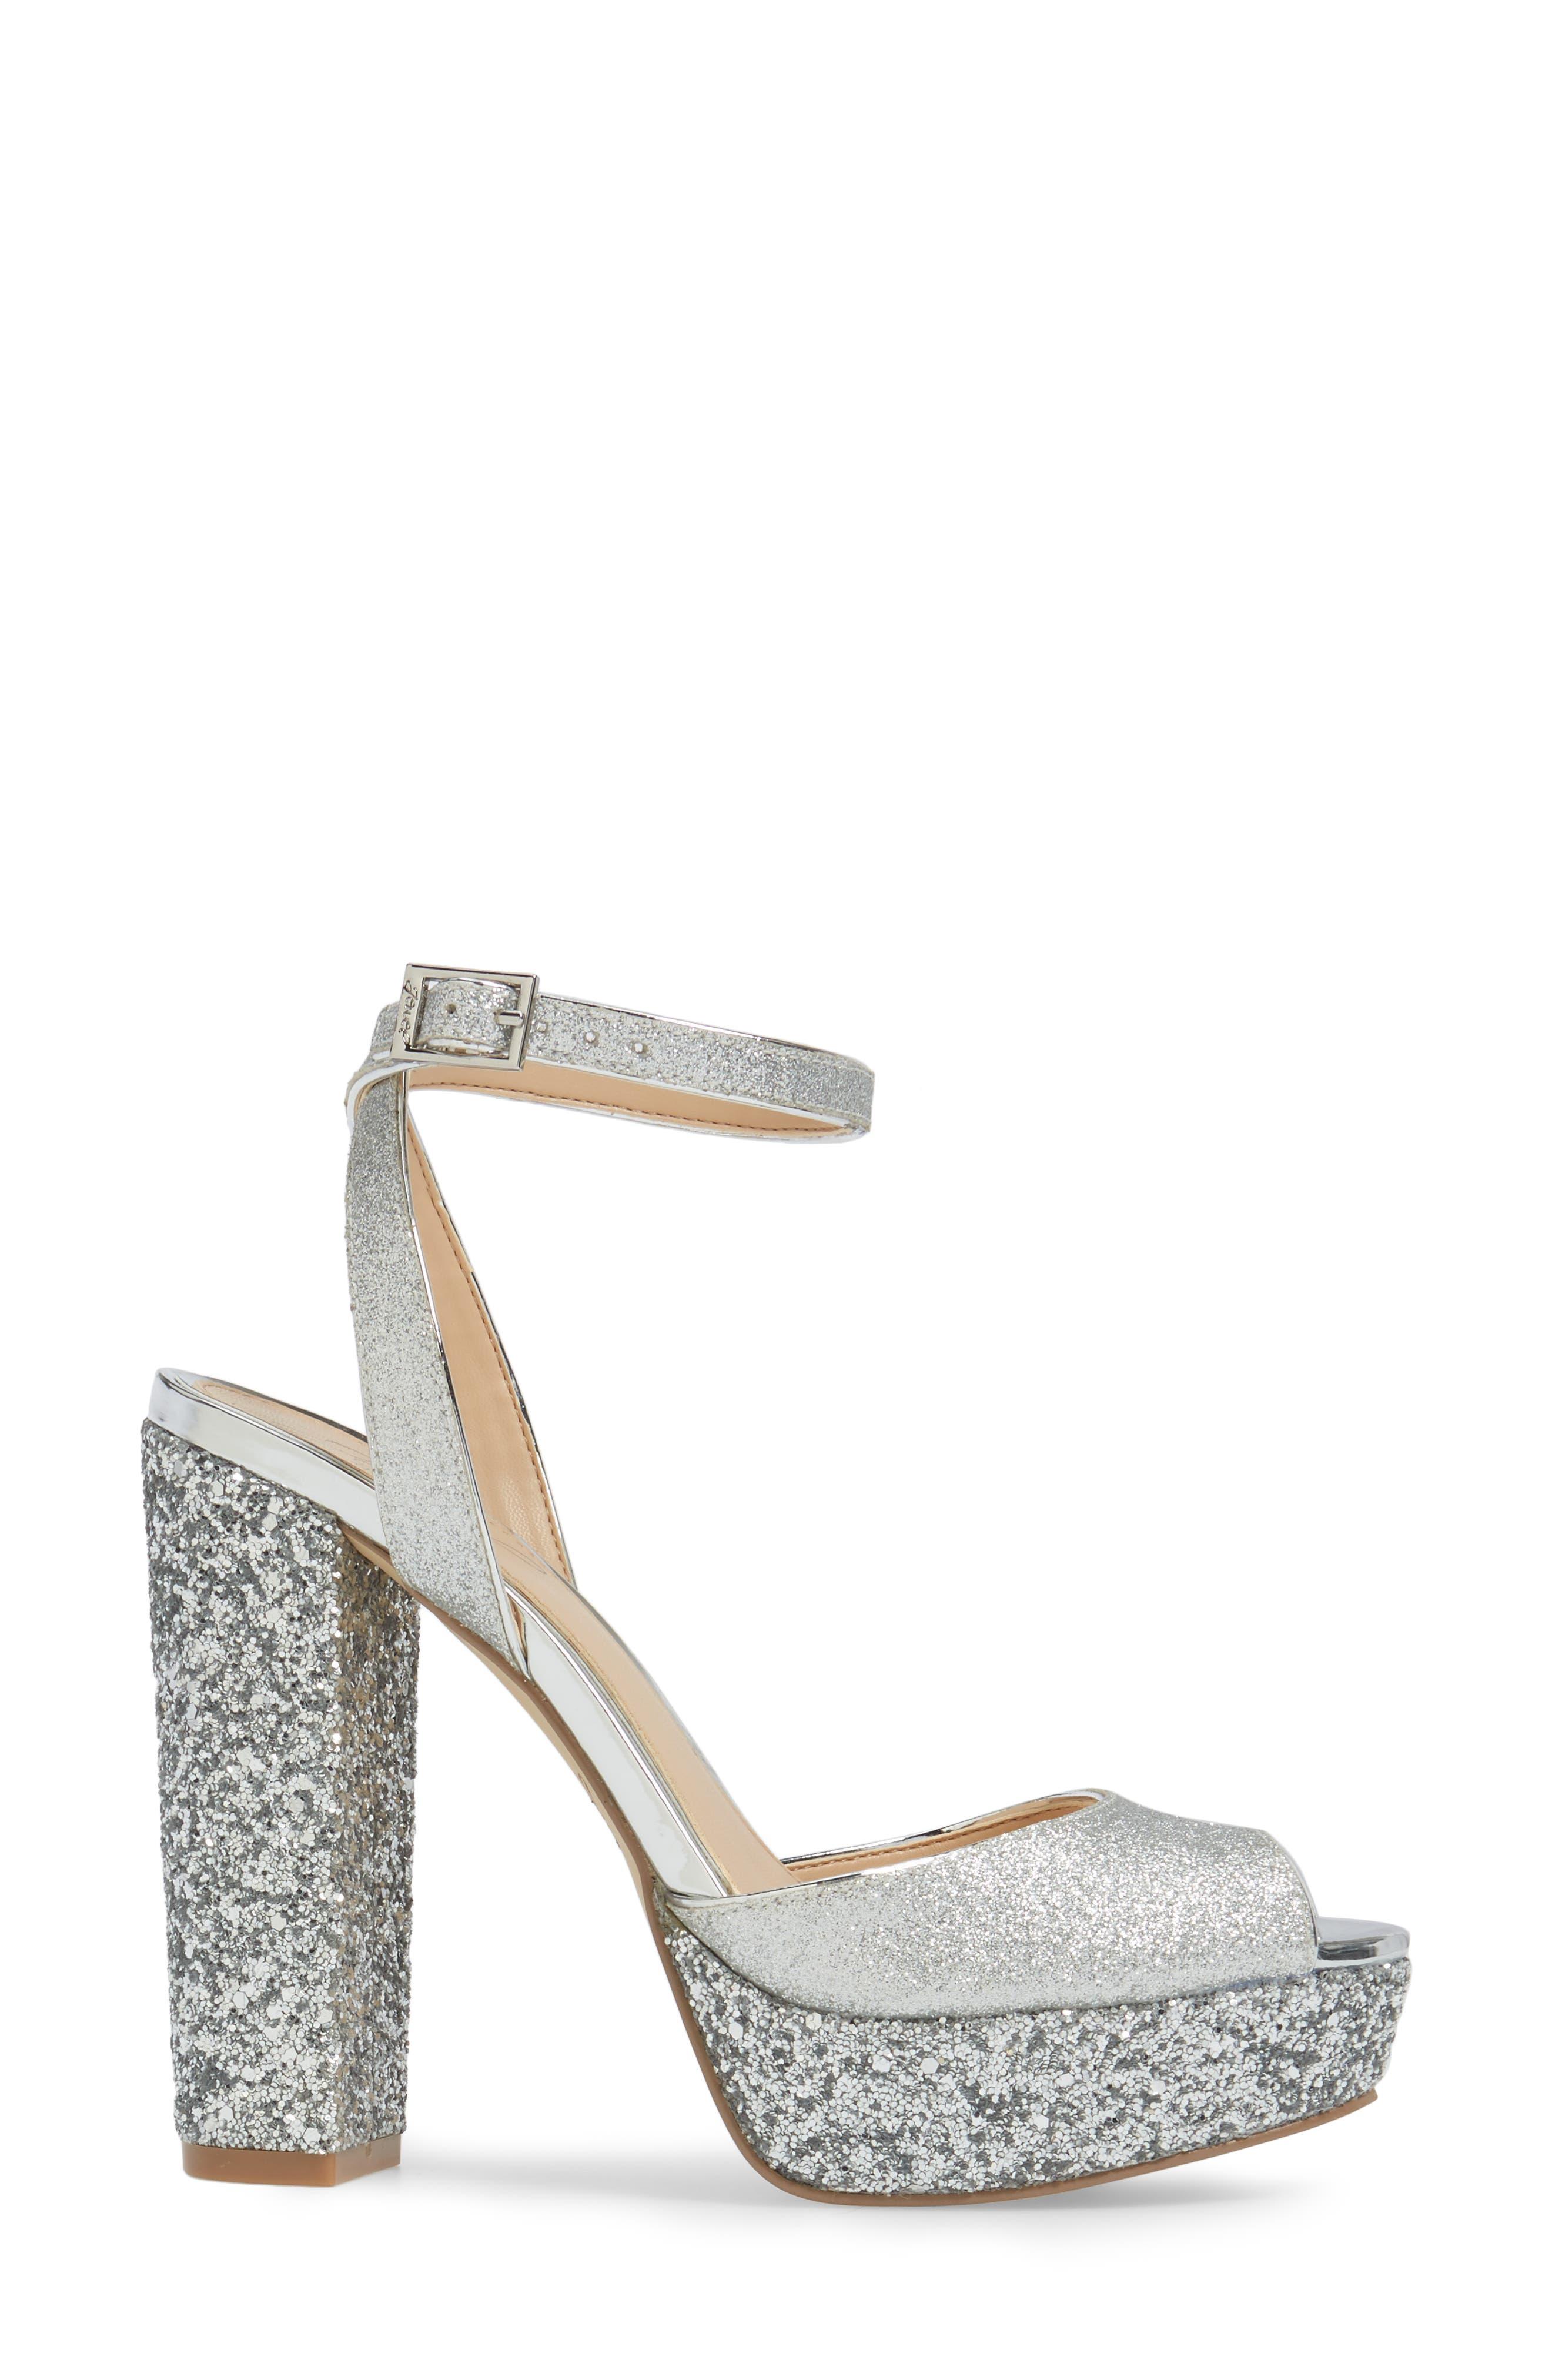 Luke Platform Sandal,                             Alternate thumbnail 3, color,                             Silver Leather